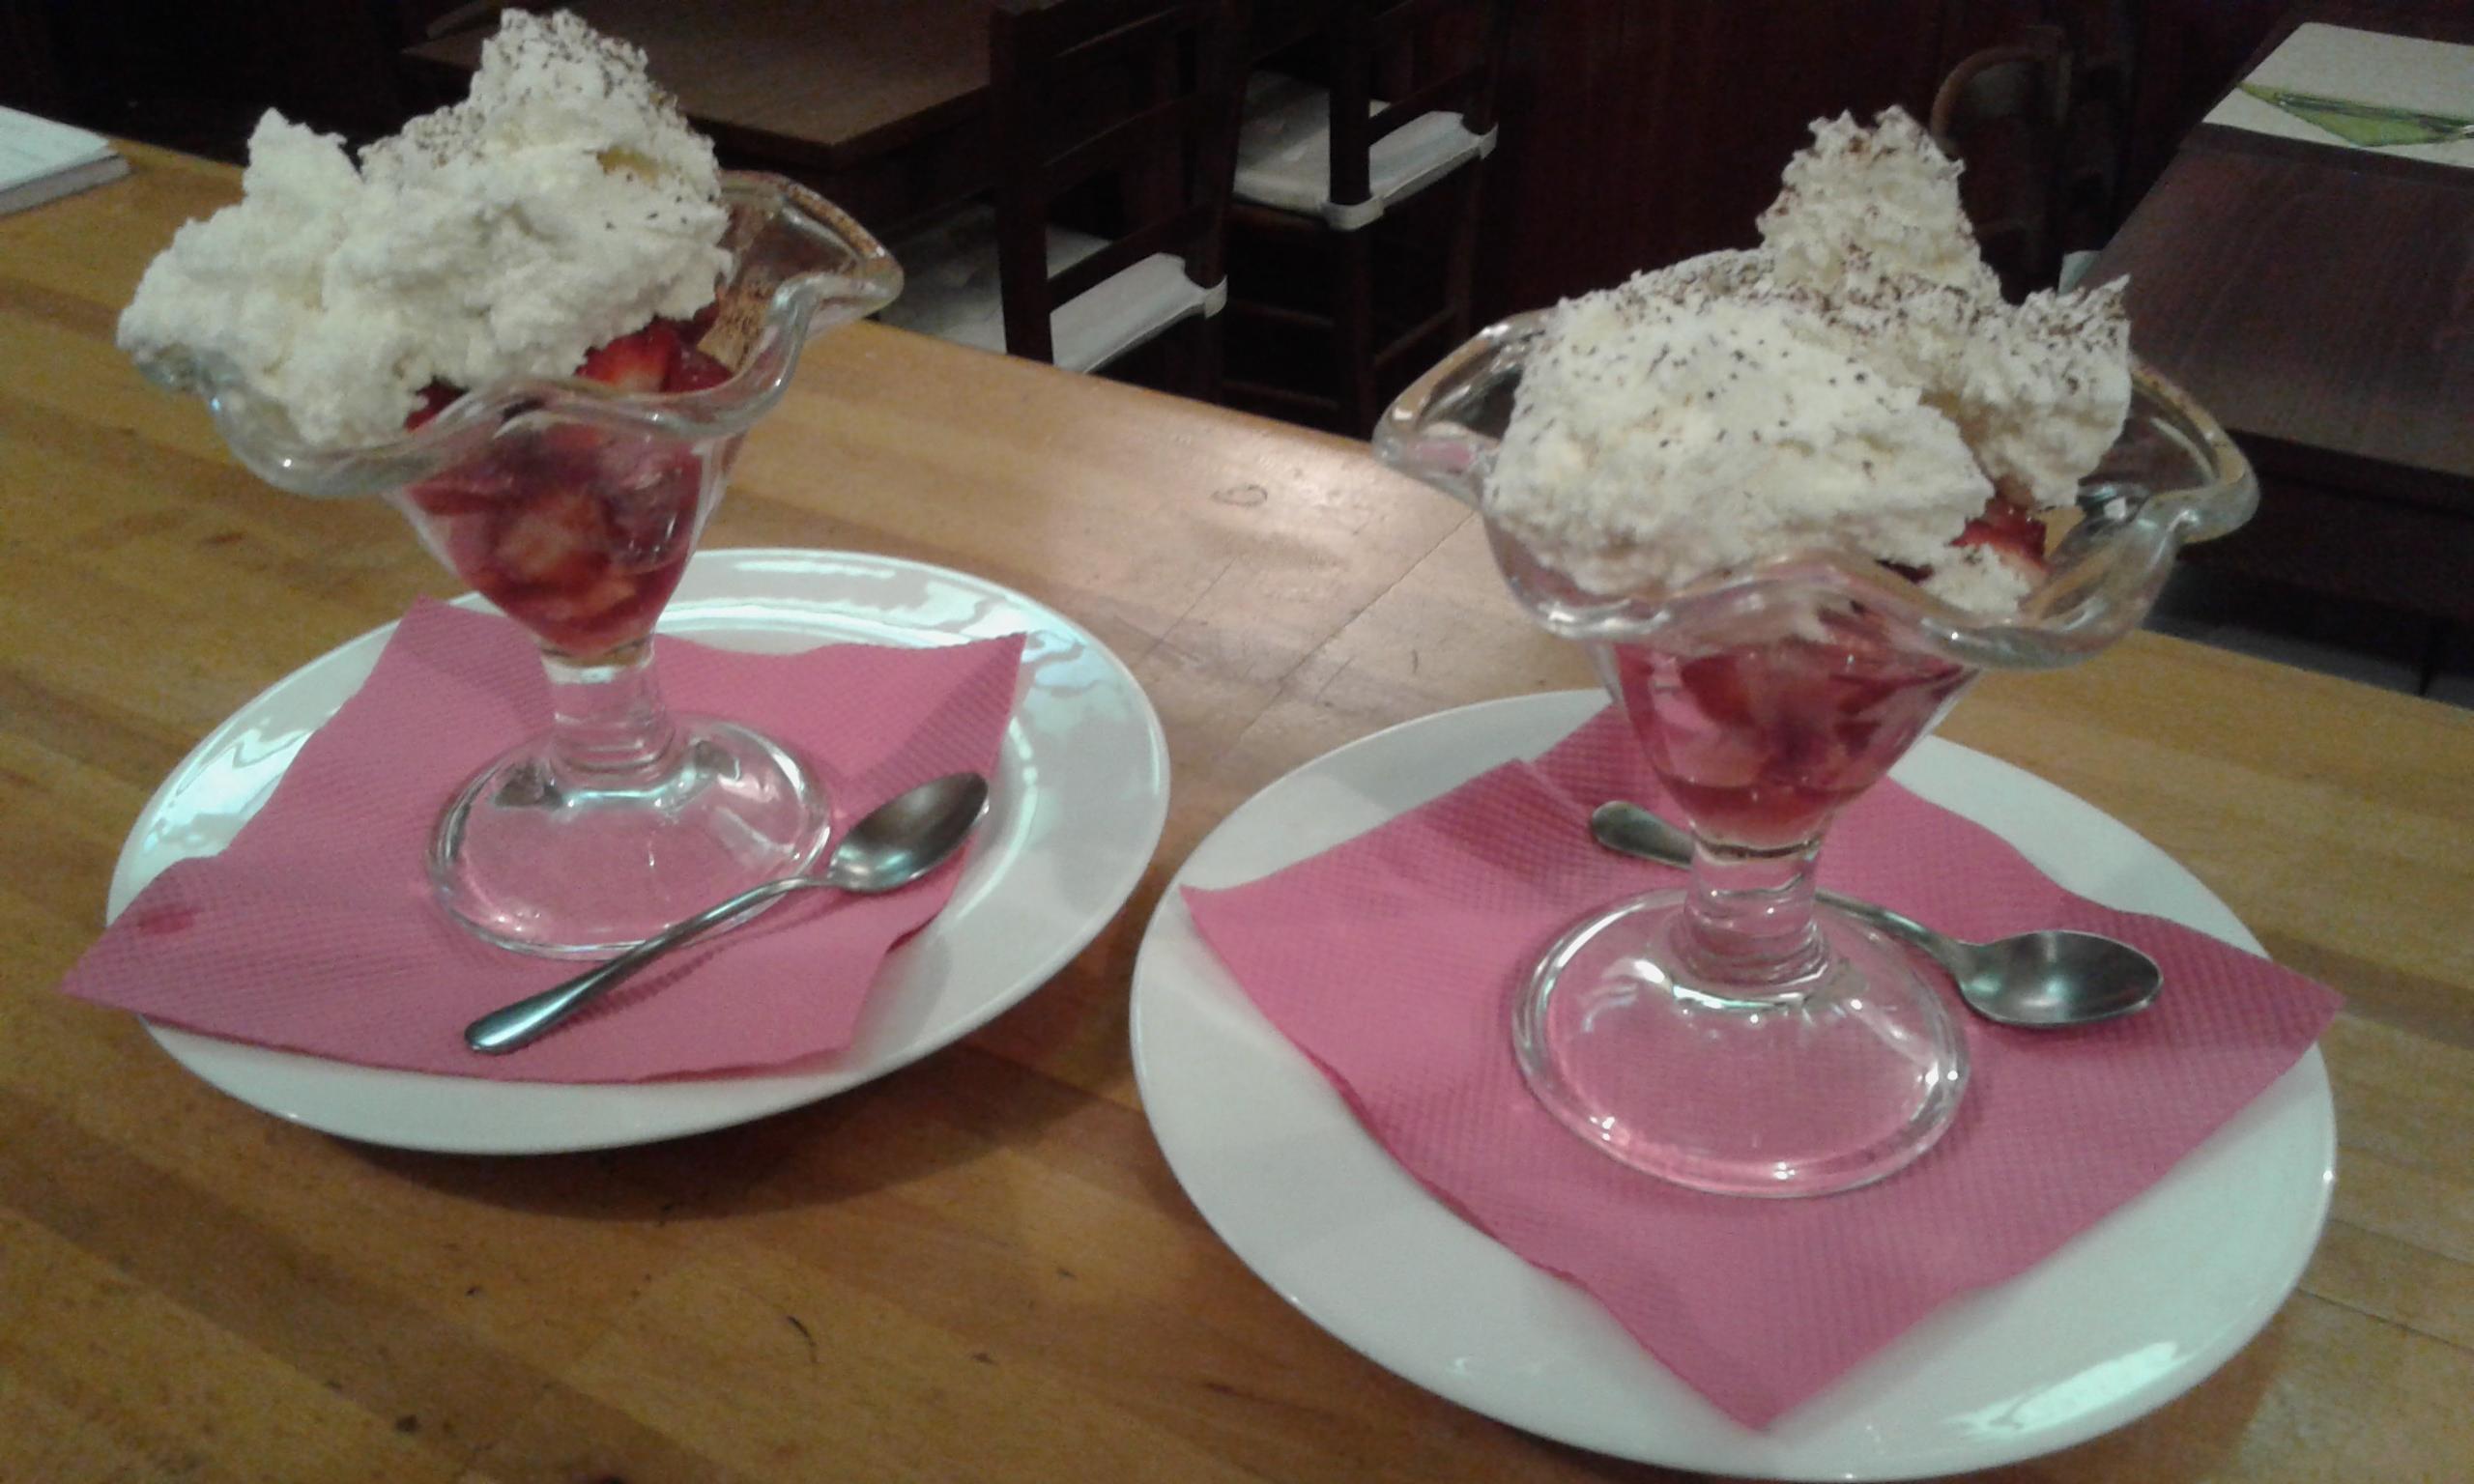 Fresas y mousse de chocolate blanco